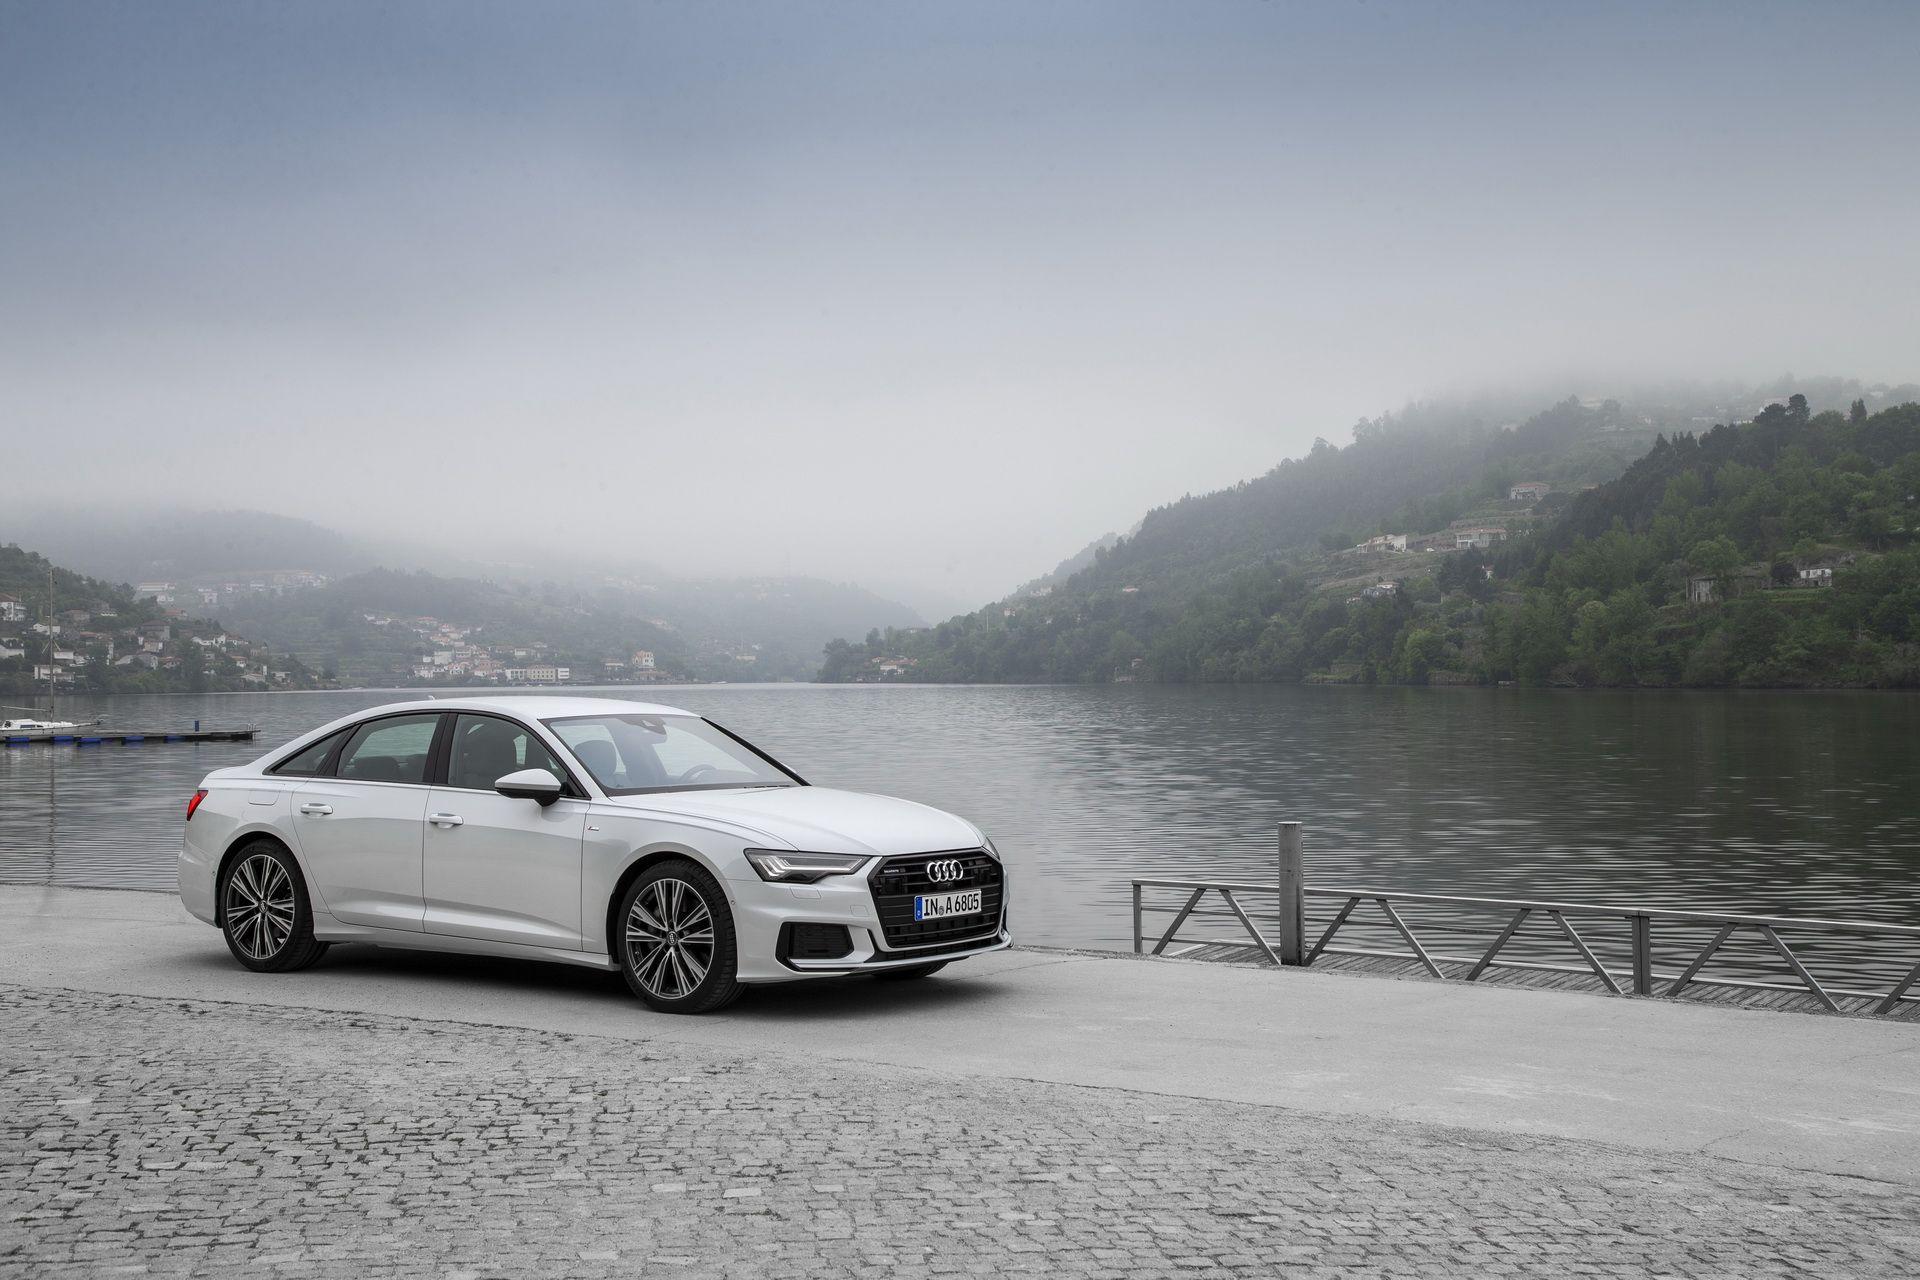 2019 Audi A6 Shows Off Taifun Grey Porto Suzuka Grey And Firmament